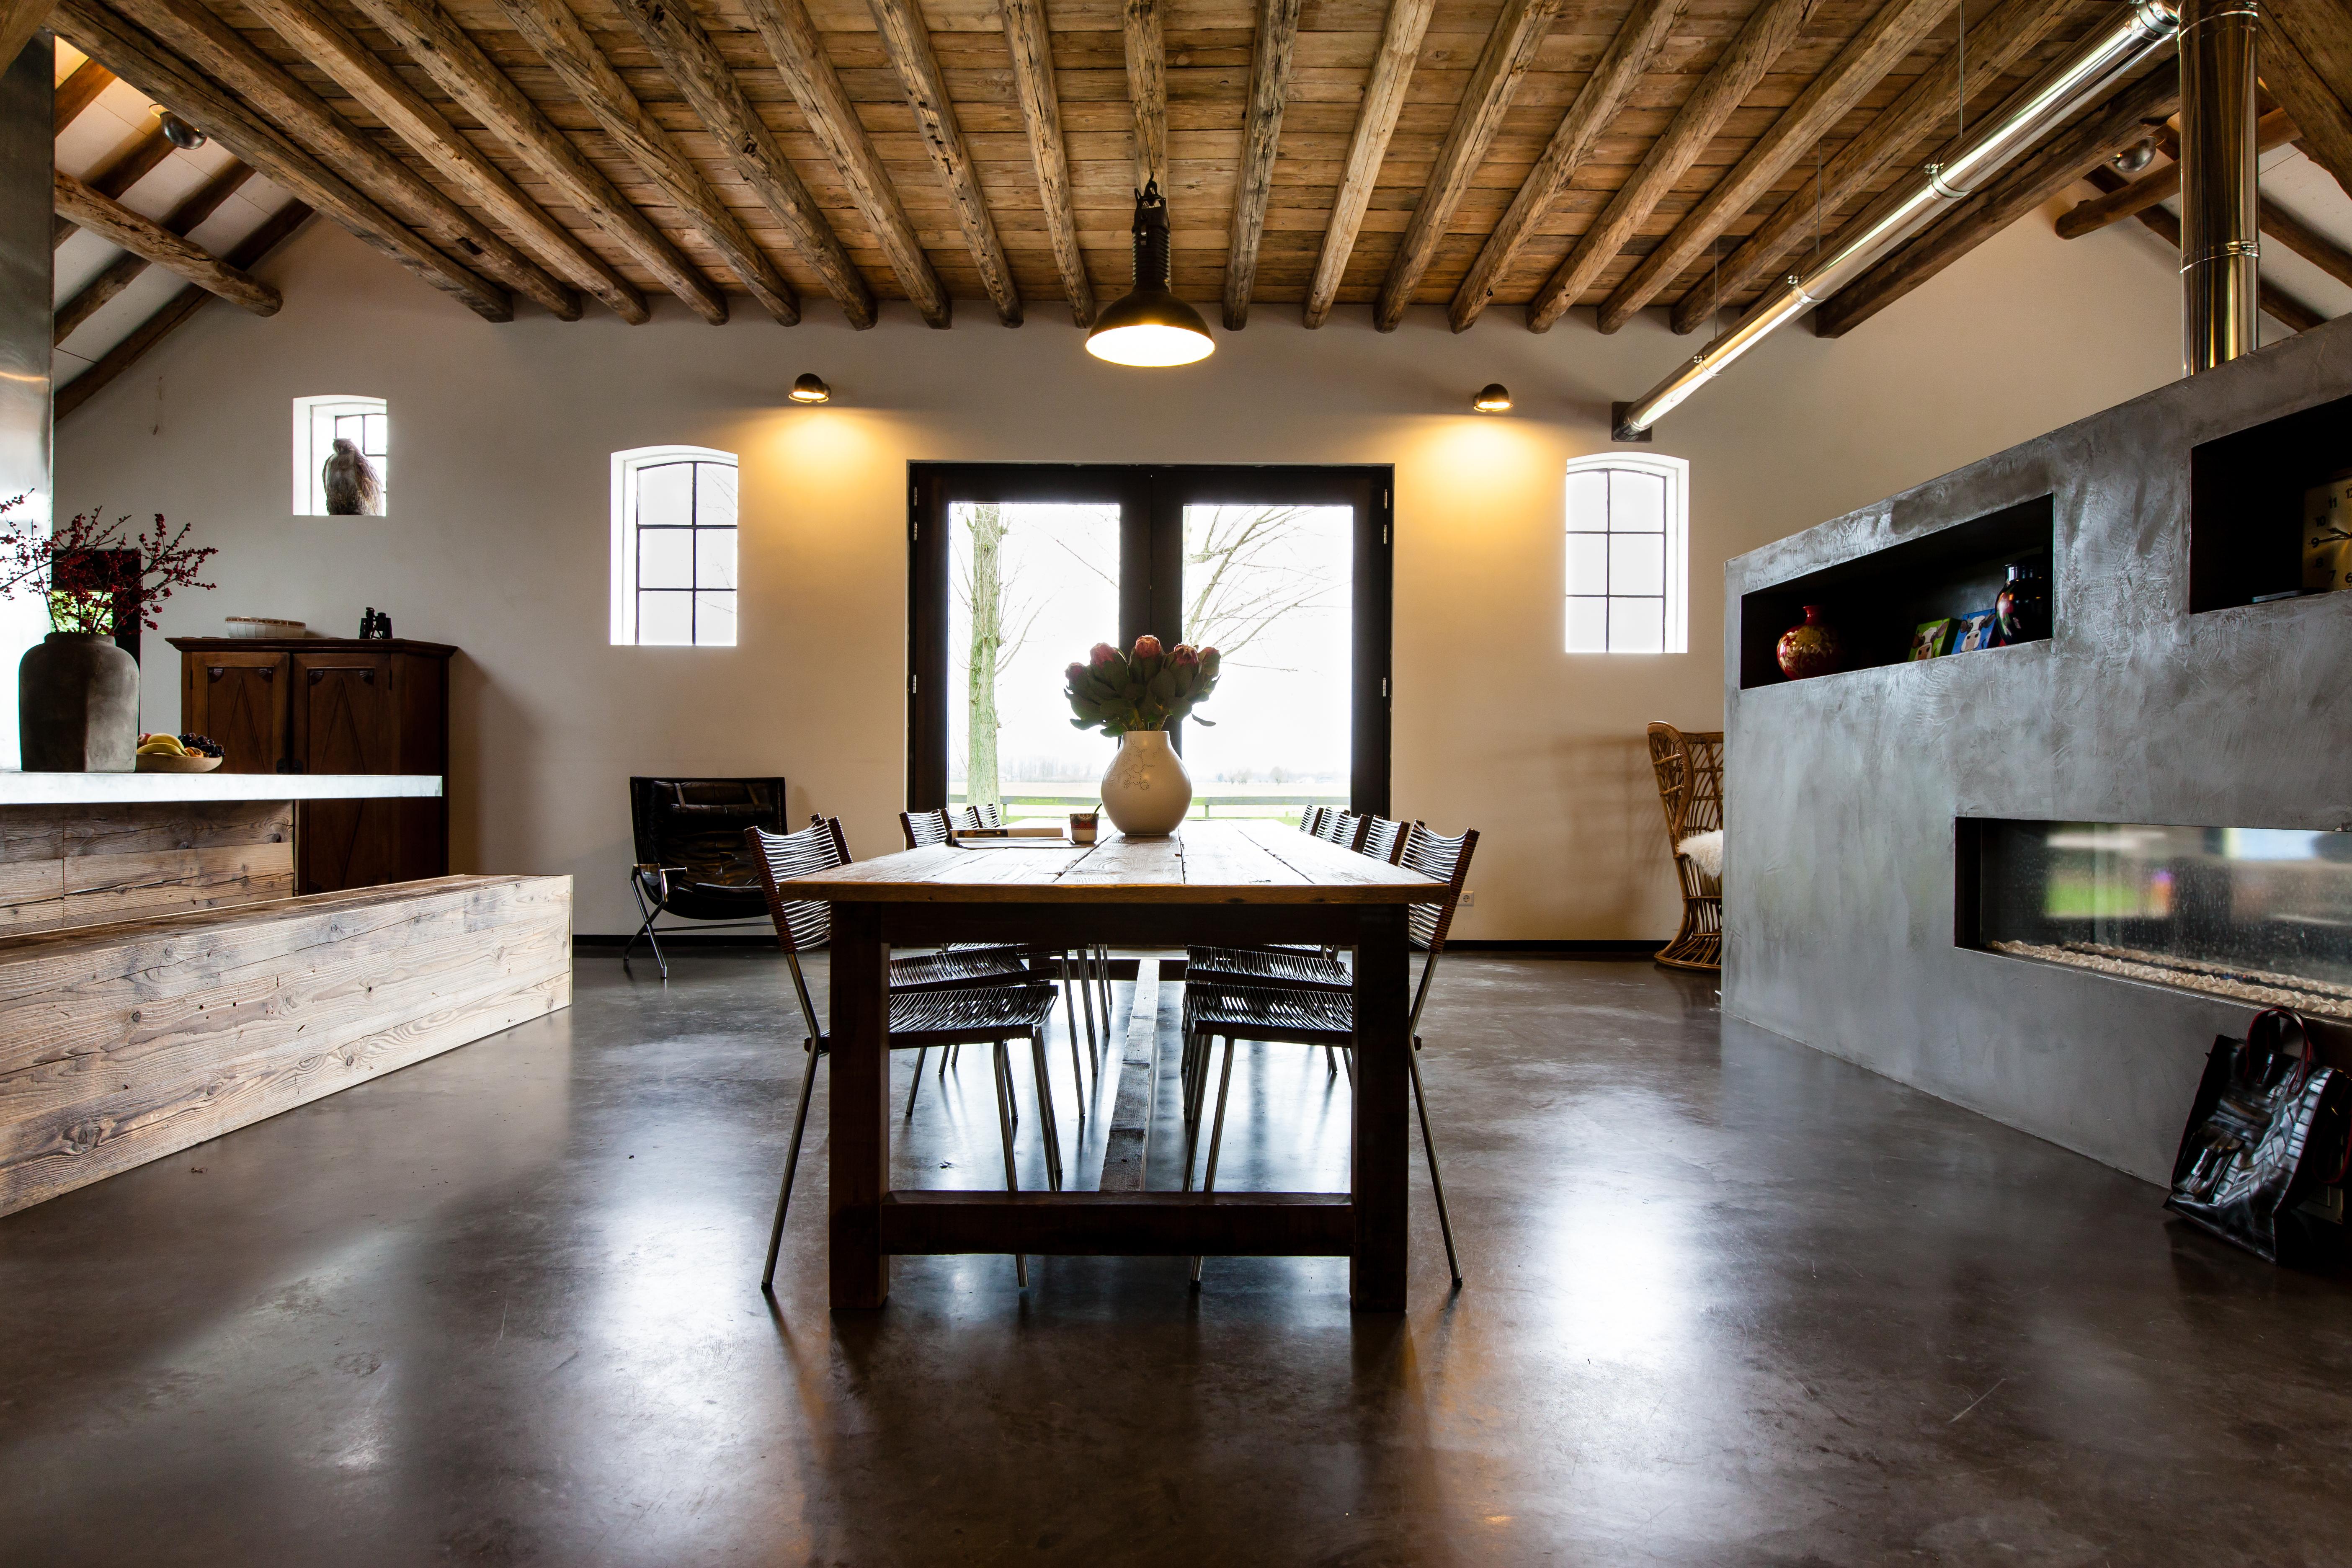 Betonvloer woonkamer prijs - THOMAS GASPERSZ